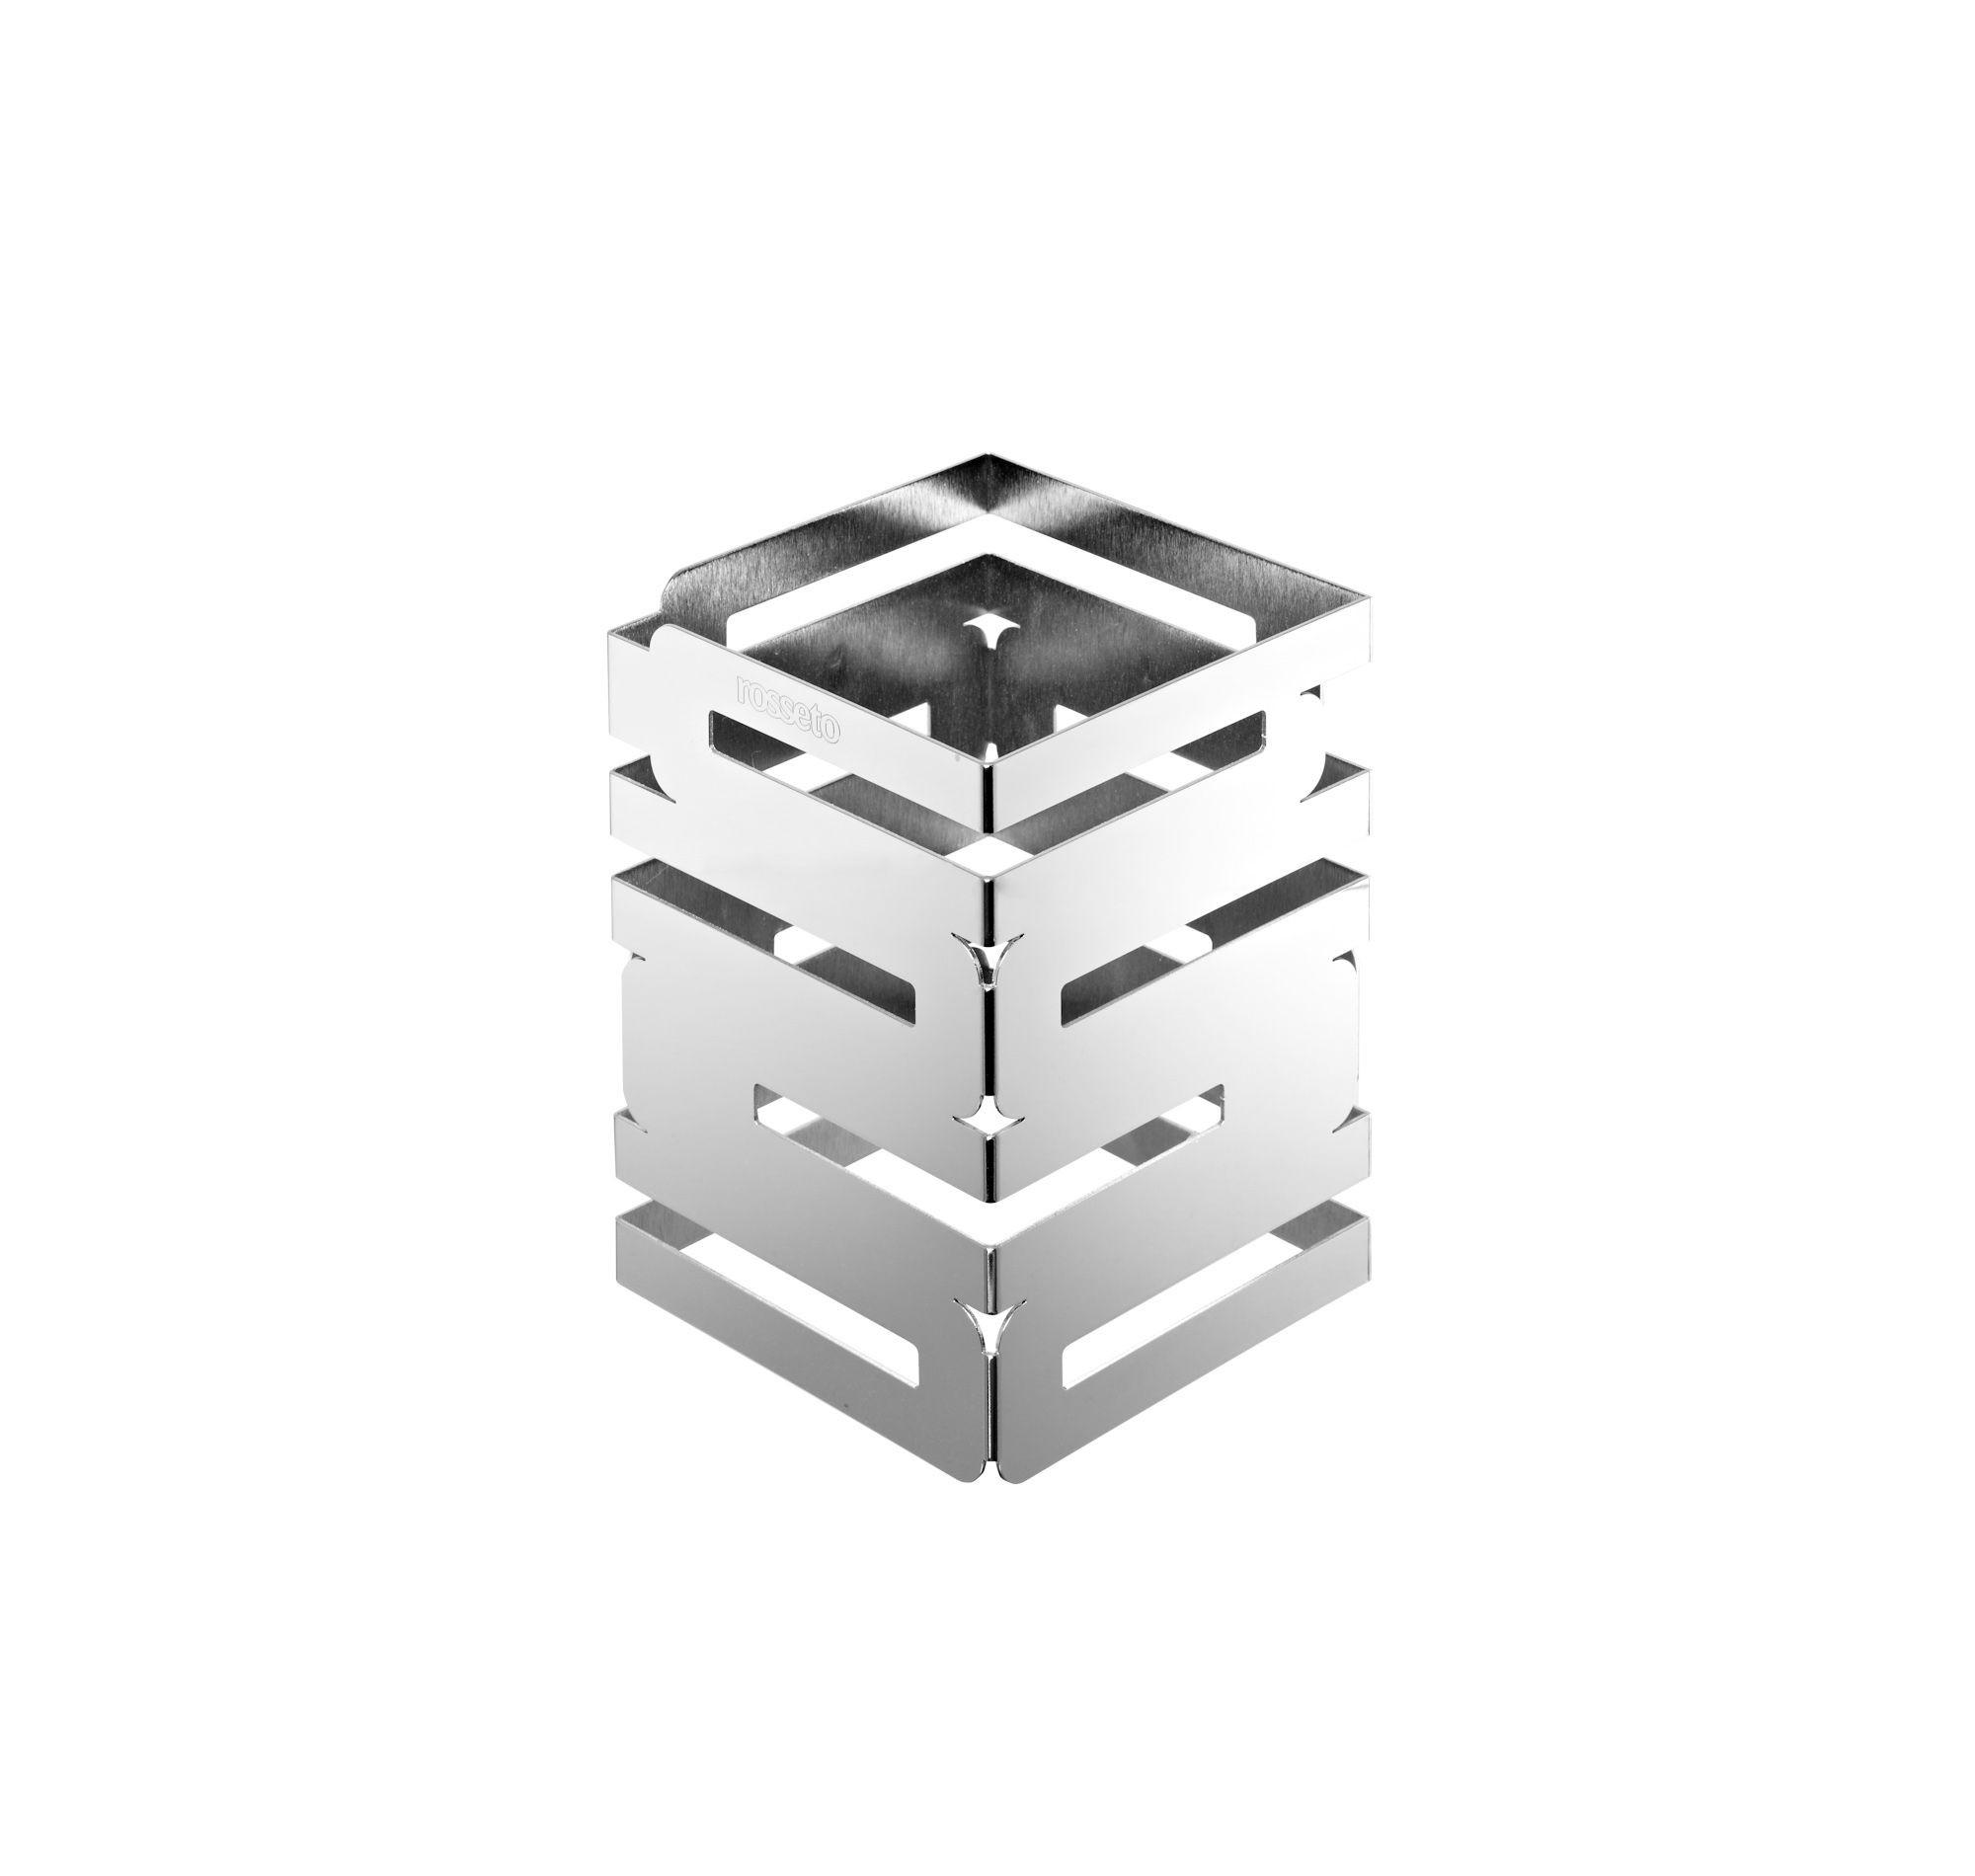 "Rosseto SM105 Skycap Chrome Plated Mirror Finish Square Multi-Level Riser 6"" x 6"" x 8""H"